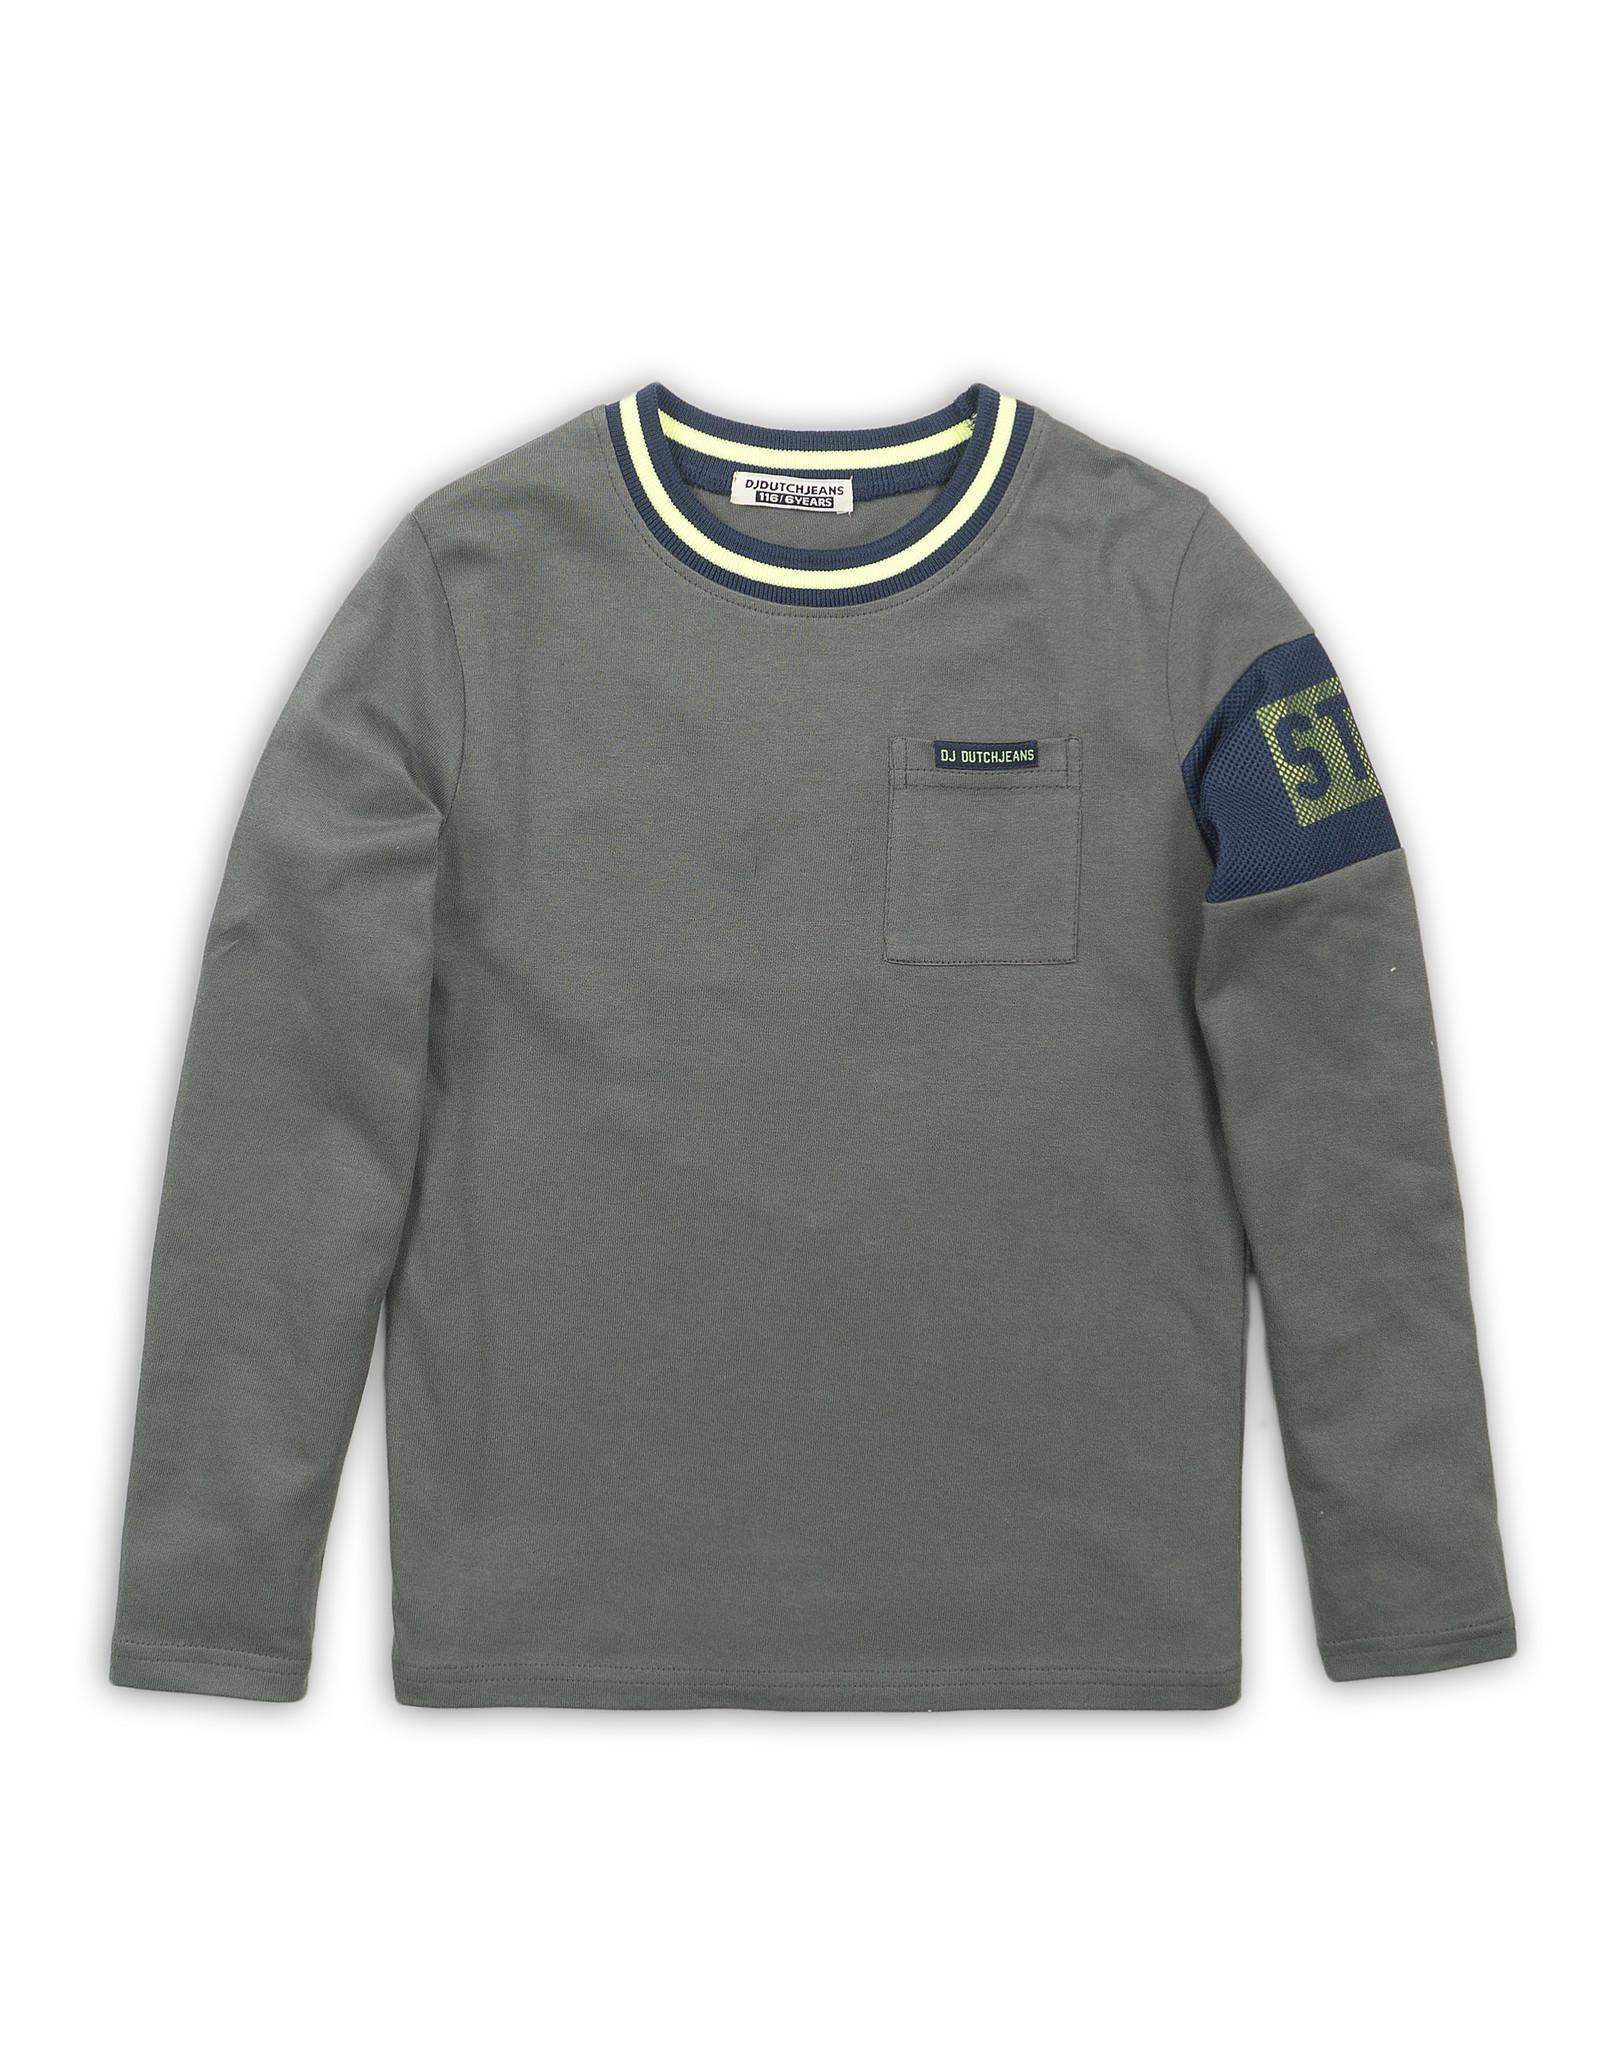 Dutch Jeans T-shirt, Army green